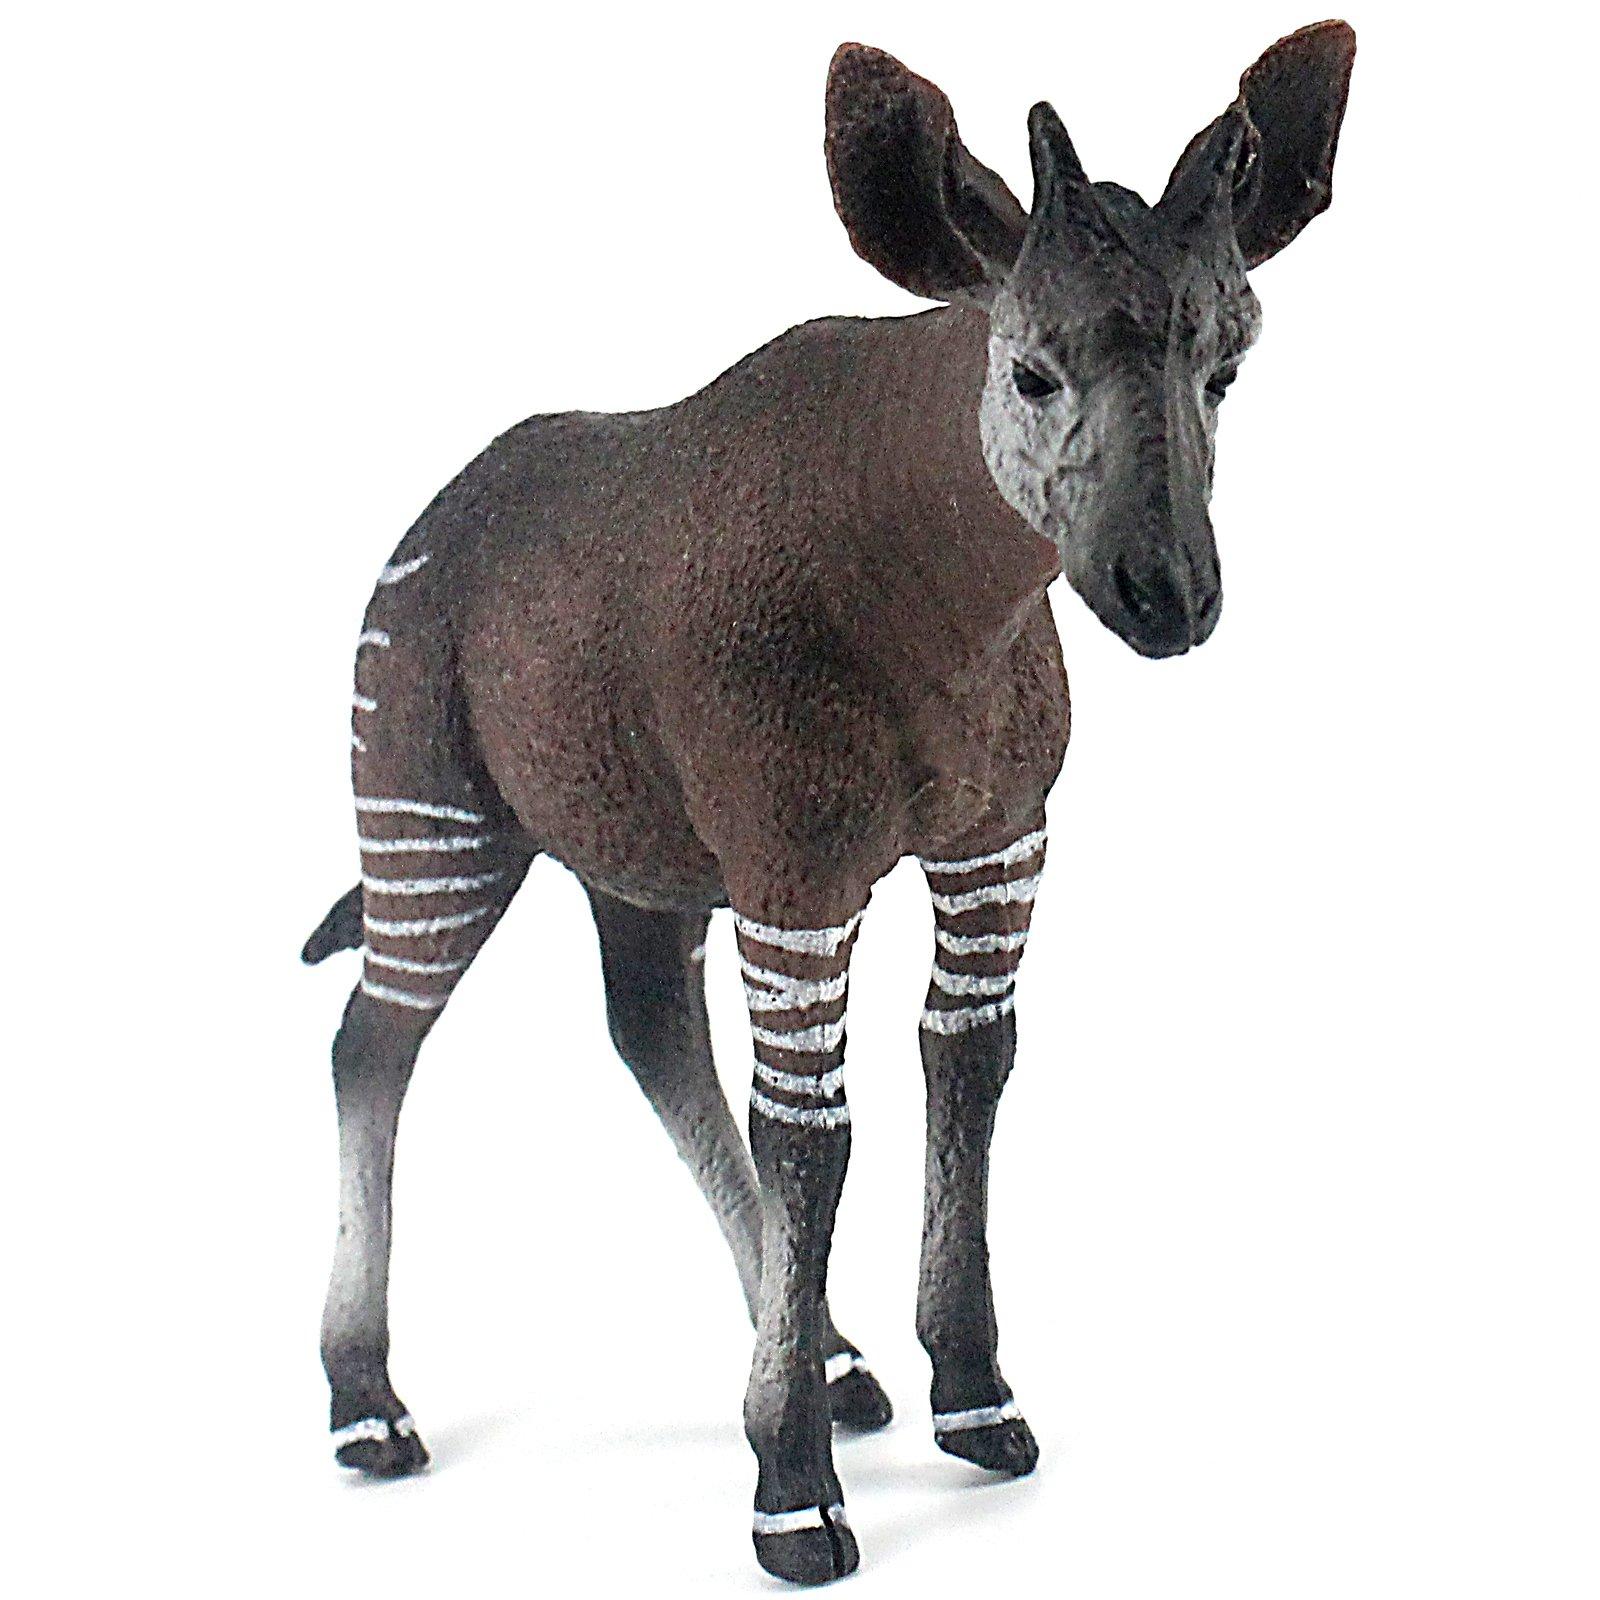 FUNSHOWCASE African Jungle Animals Male Okapi Toy Figure Realistic Plastic Figurine Height 3.5-inch